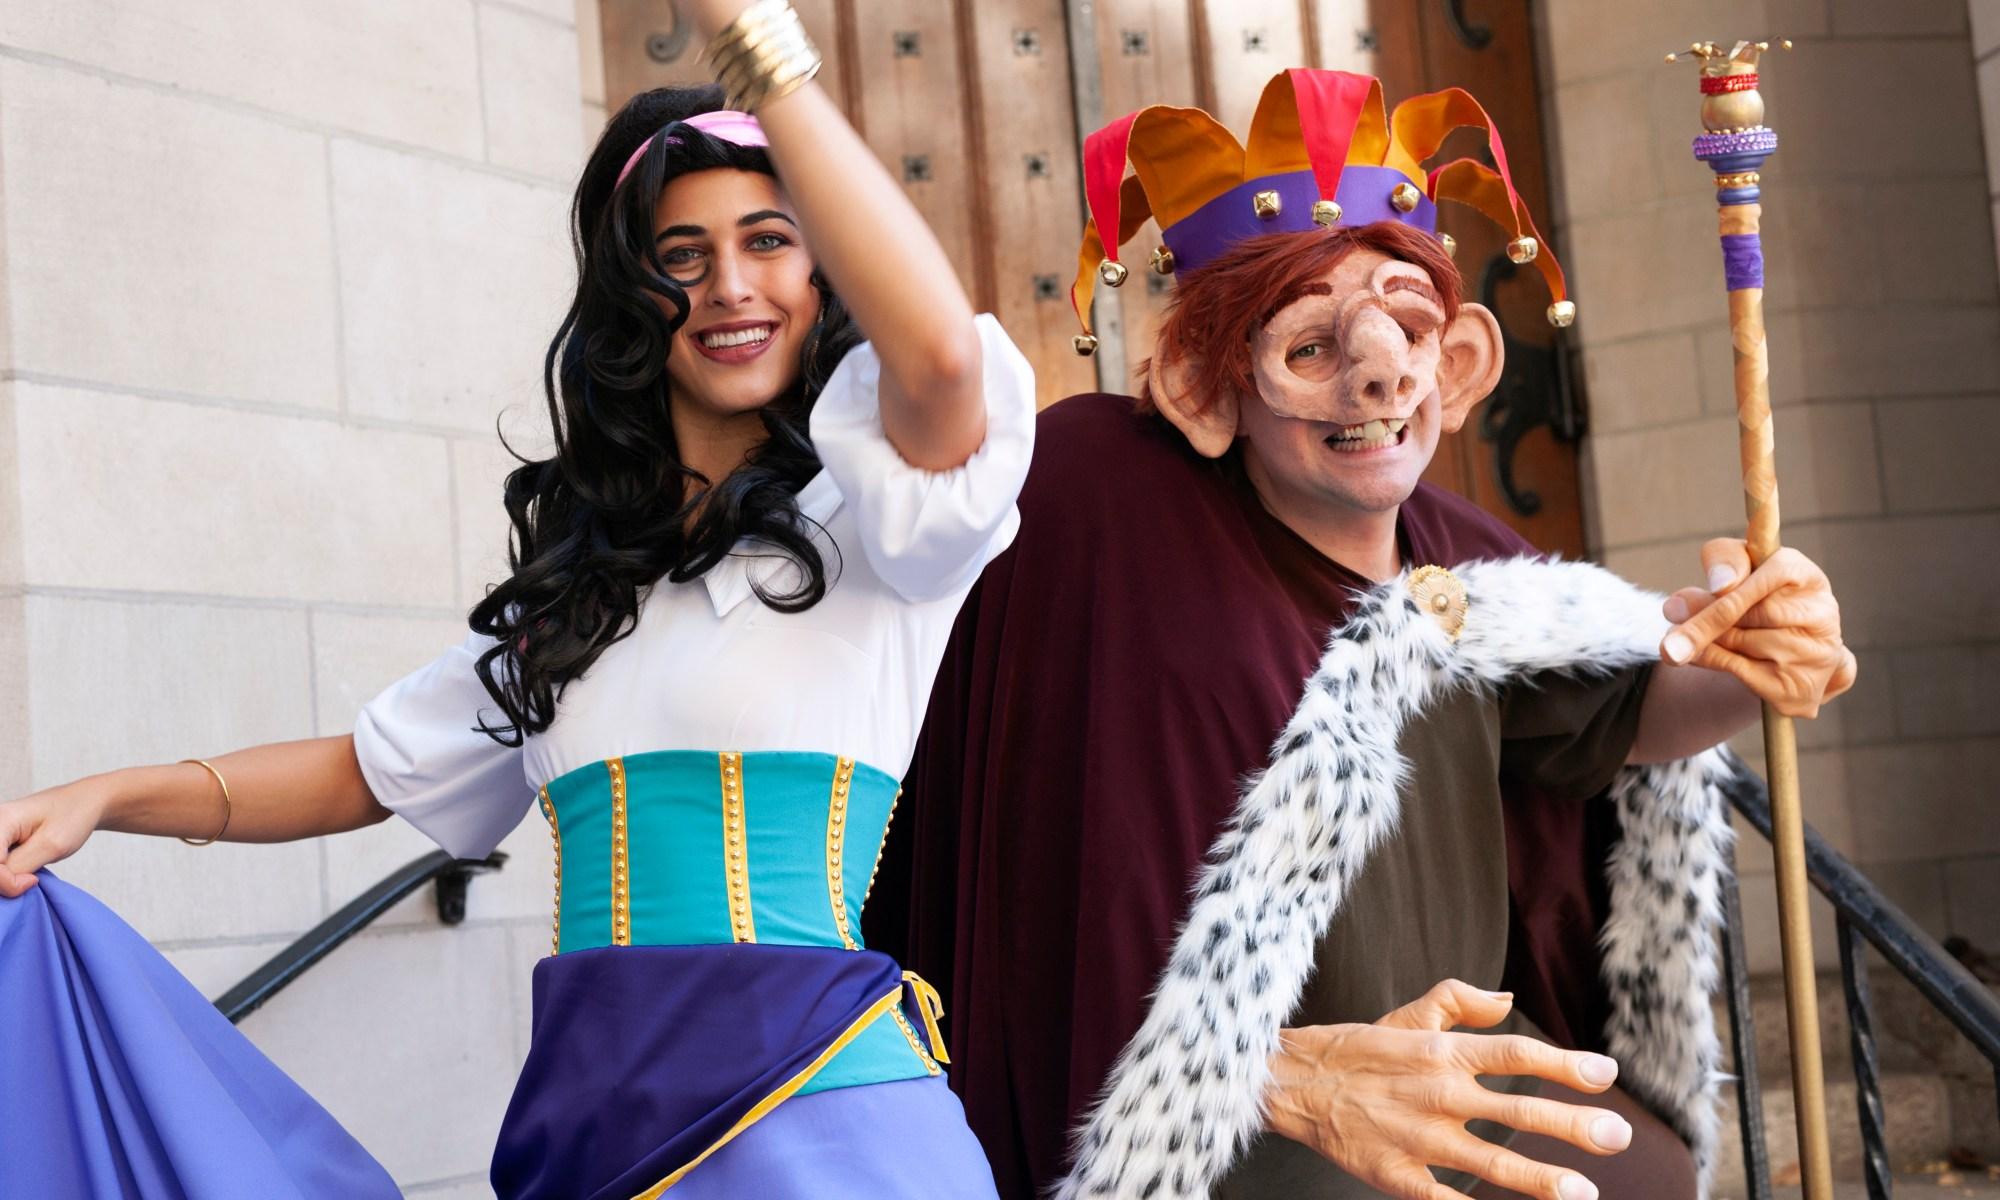 Andrea Arreaza as Esmeralda and Brendan McWhirk as Quasimodo.